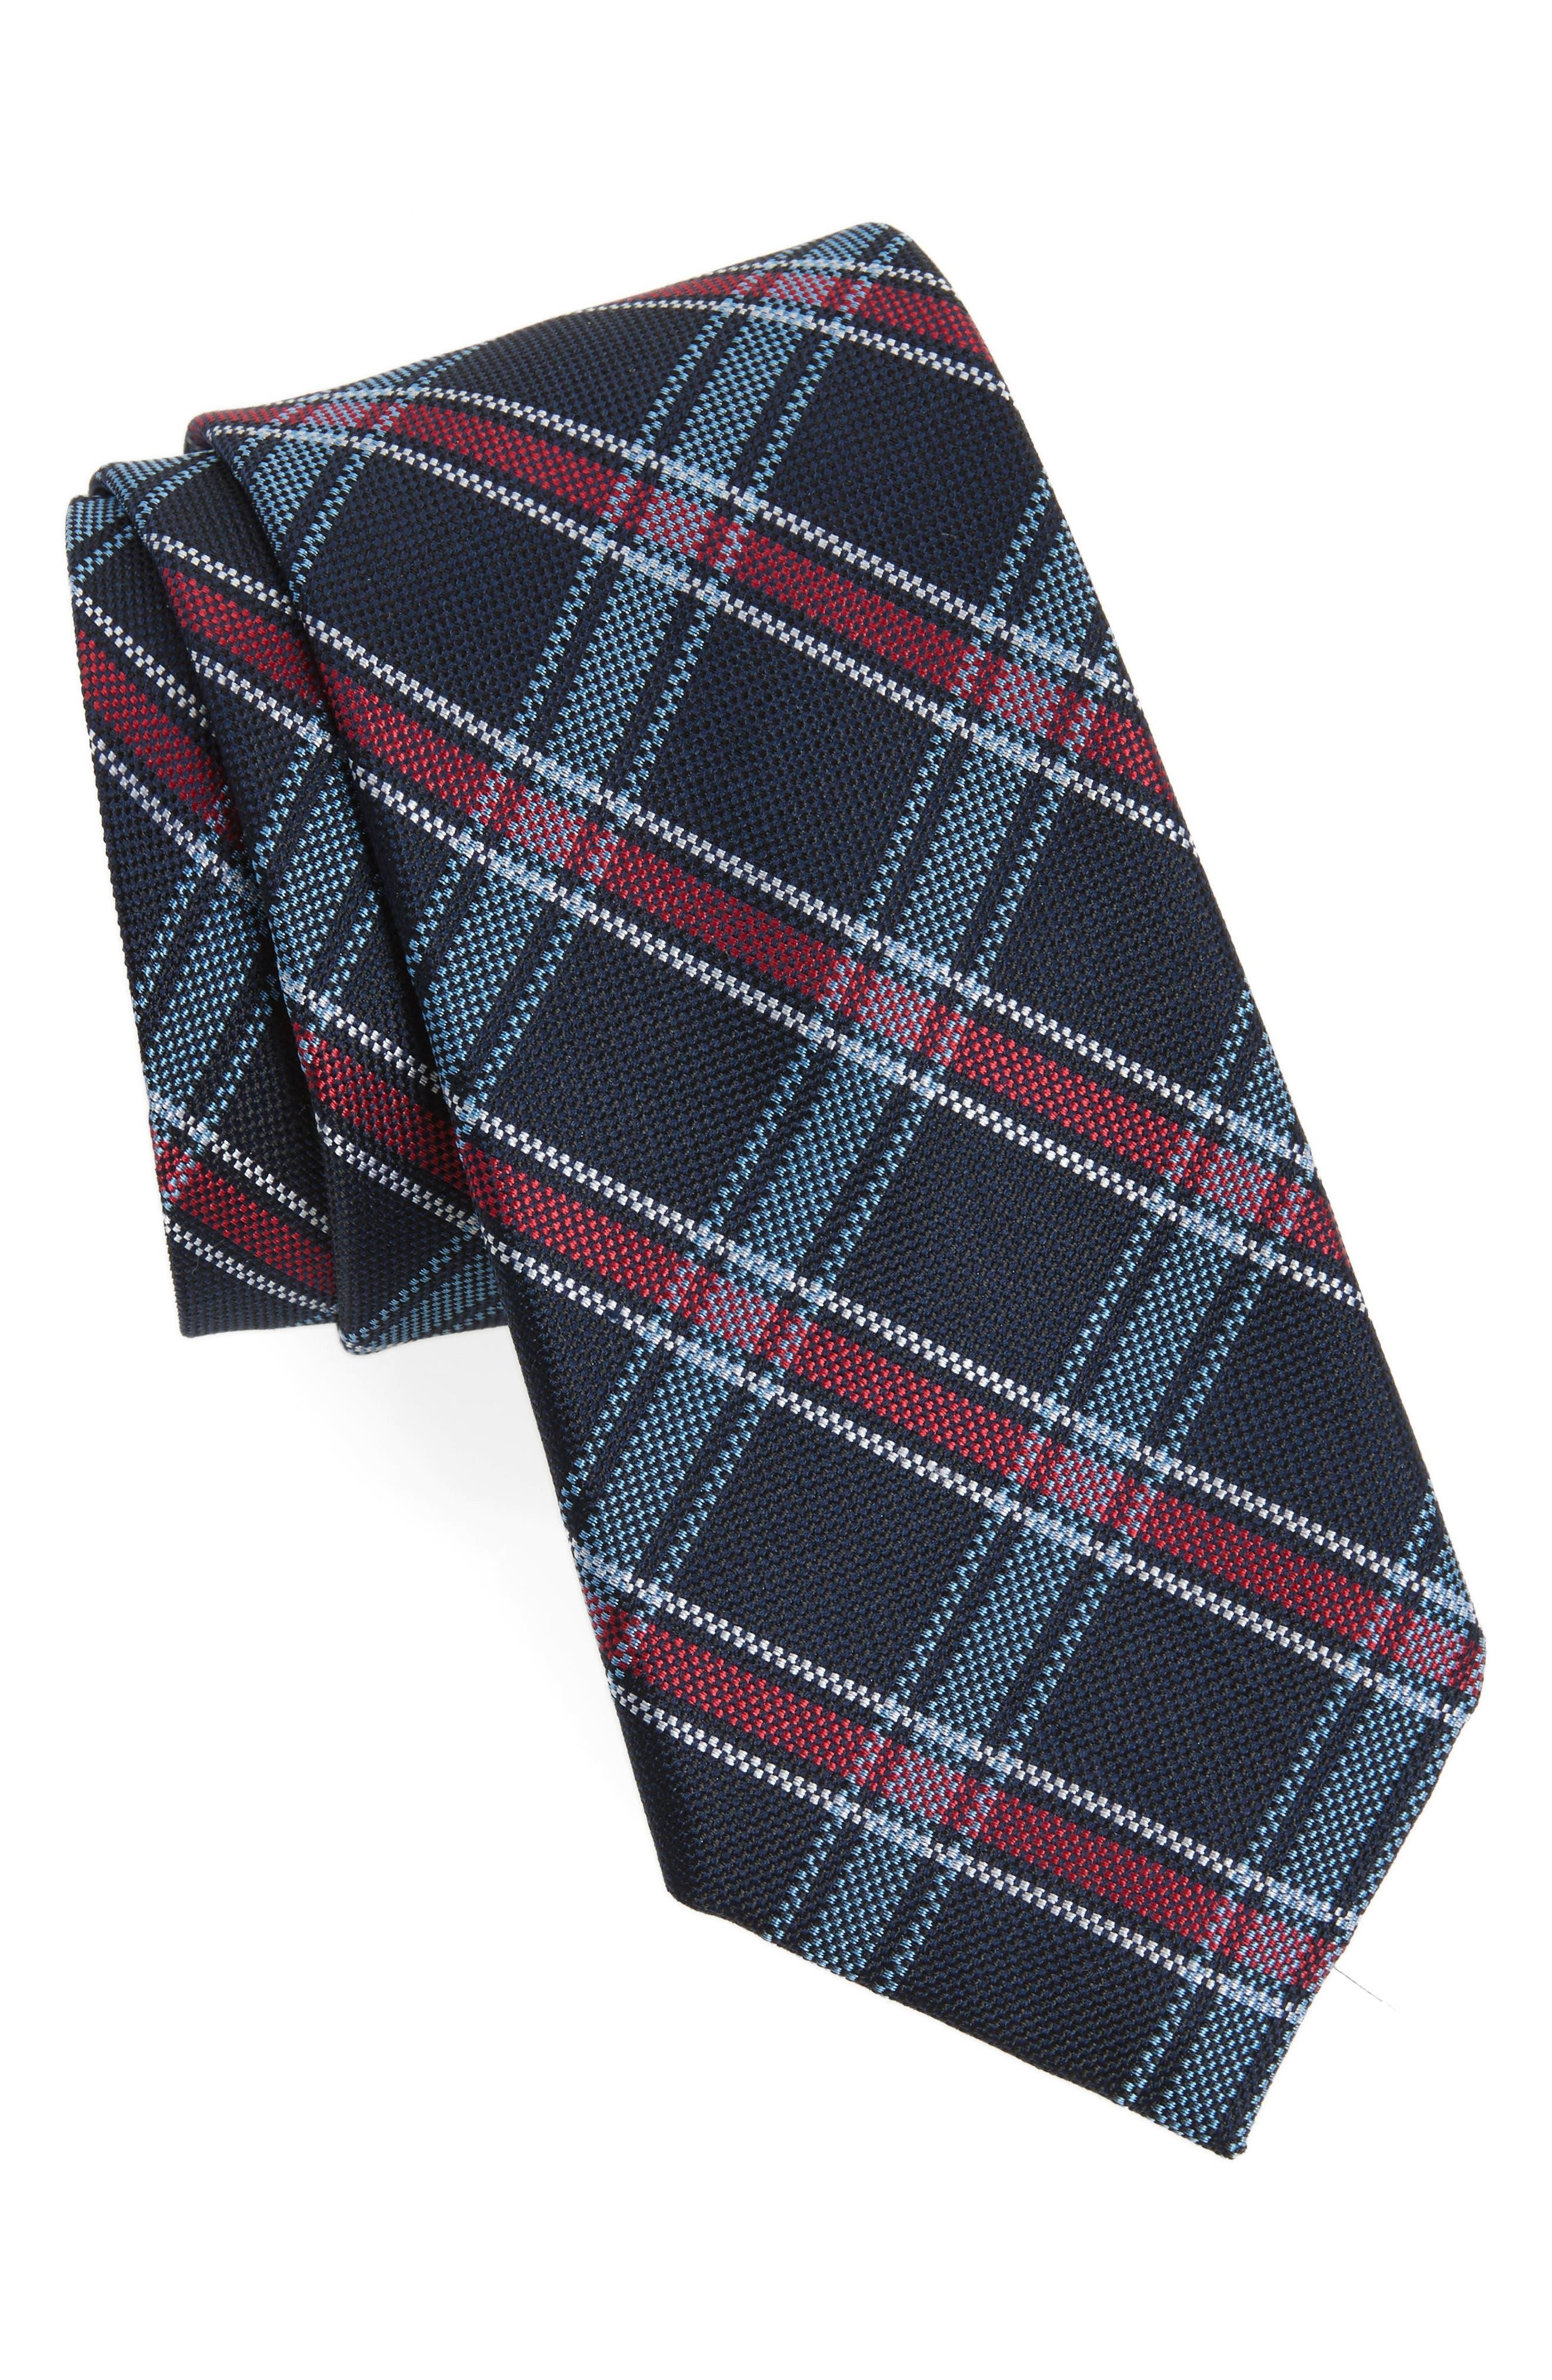 Main Image - Nordstrom Men's Shop Oxford Plaid Silk Tie